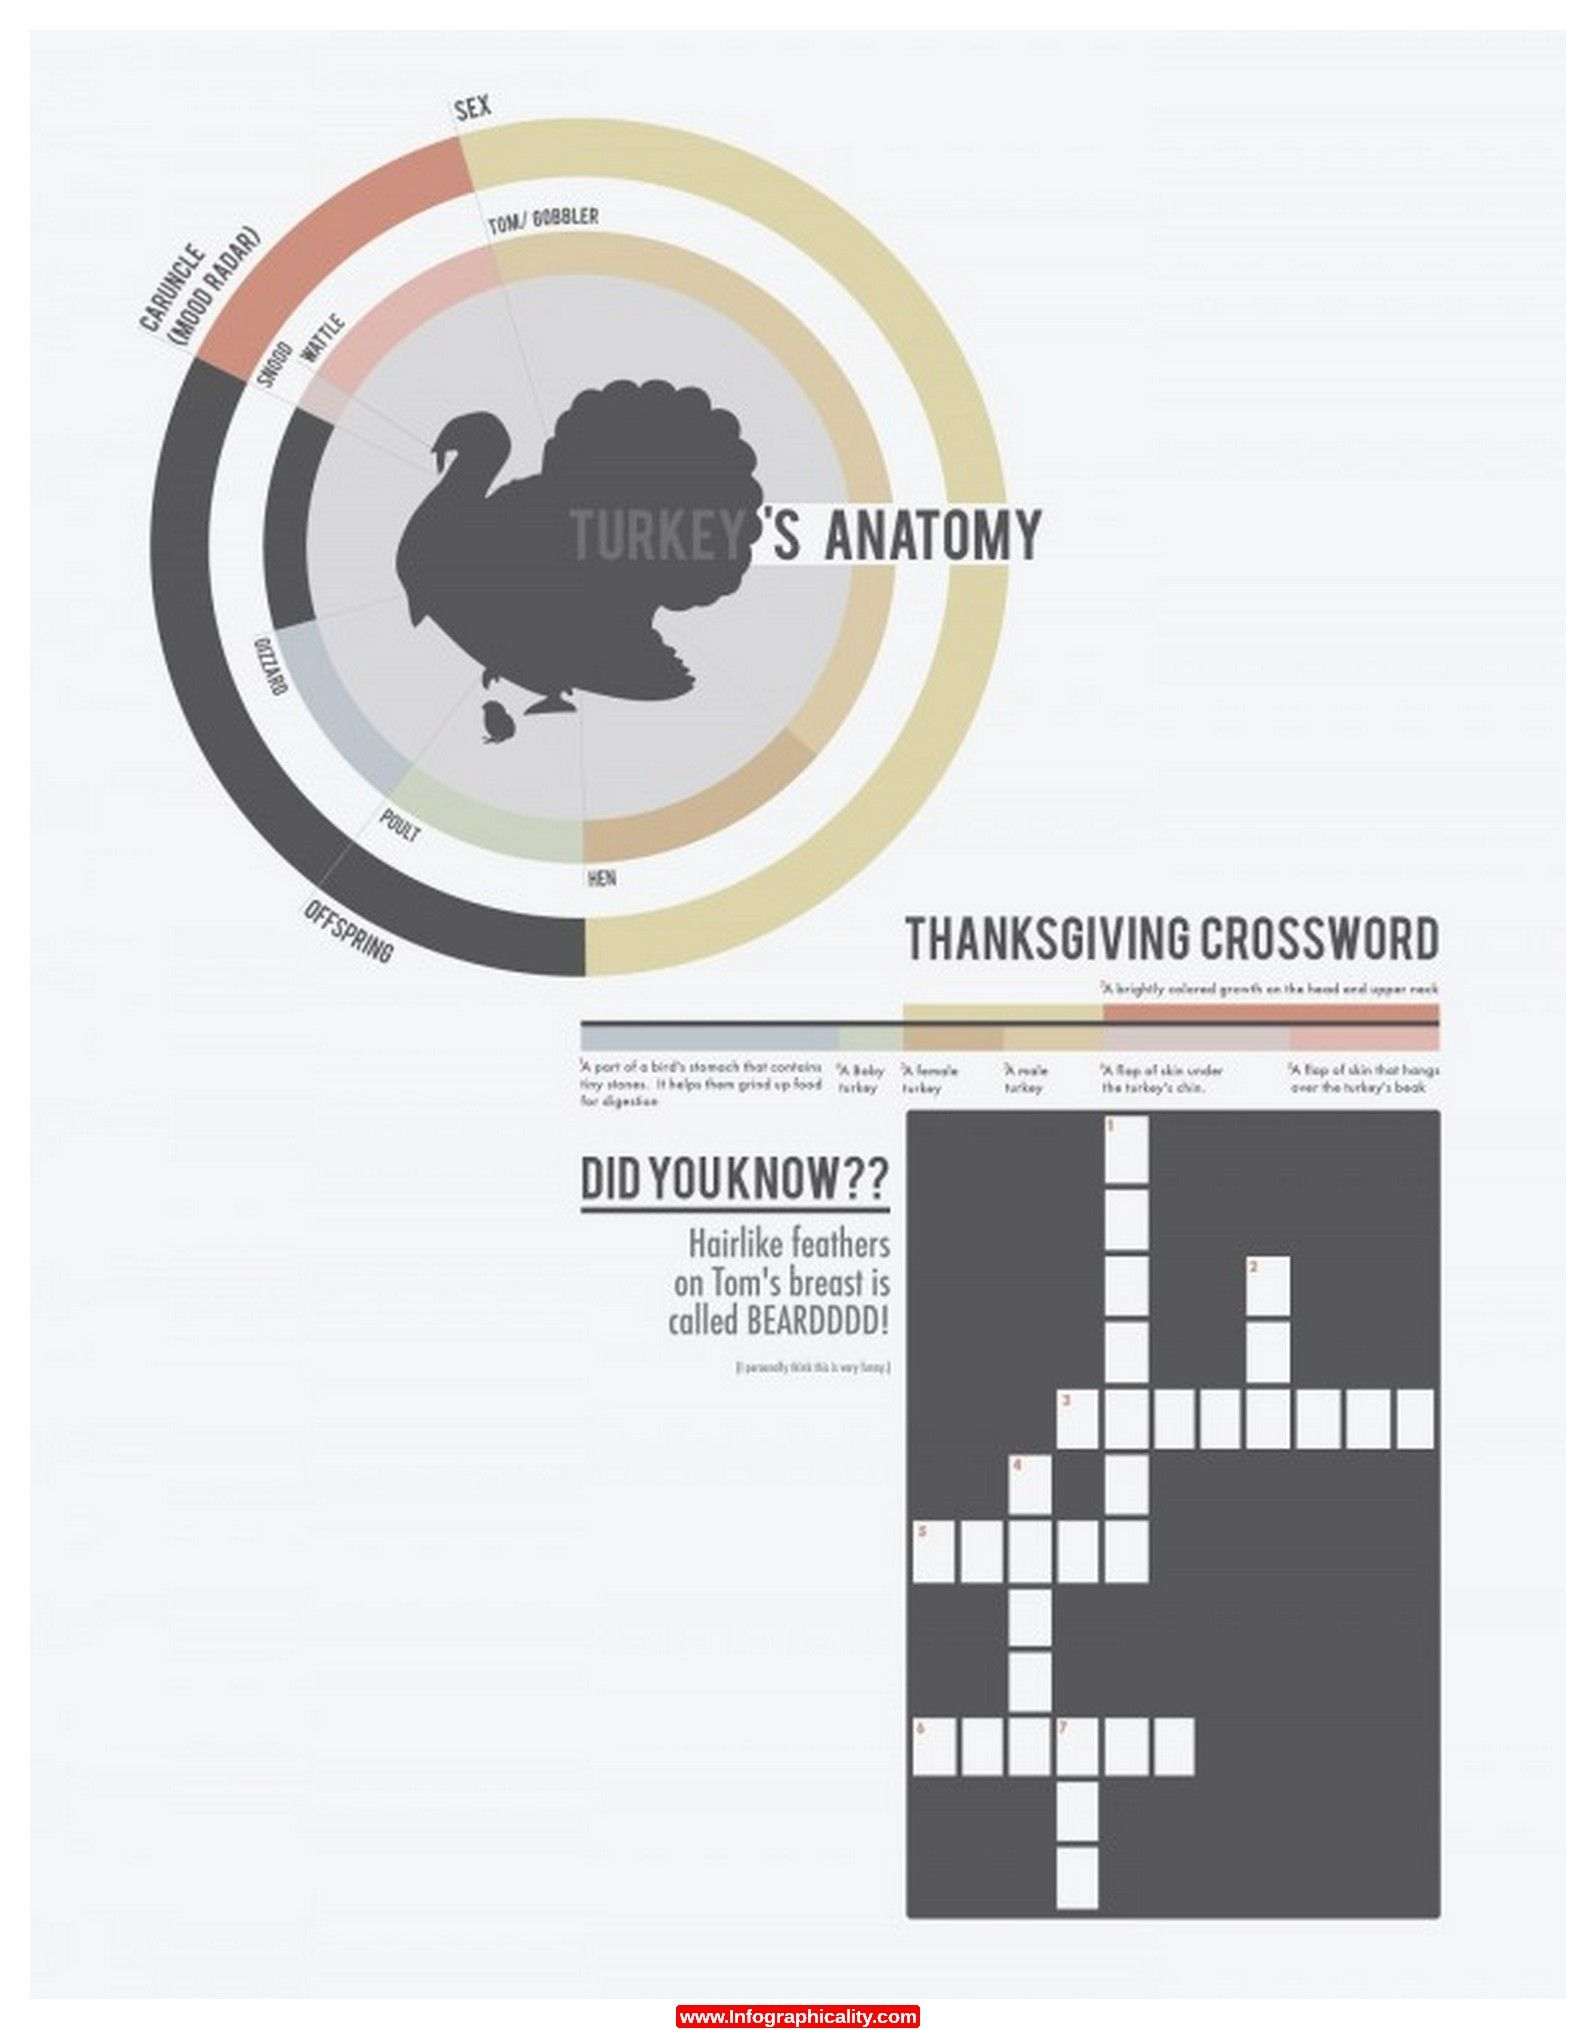 Turkey Anatomy Body Parts Animals 1 600x769 Infographic - http ...